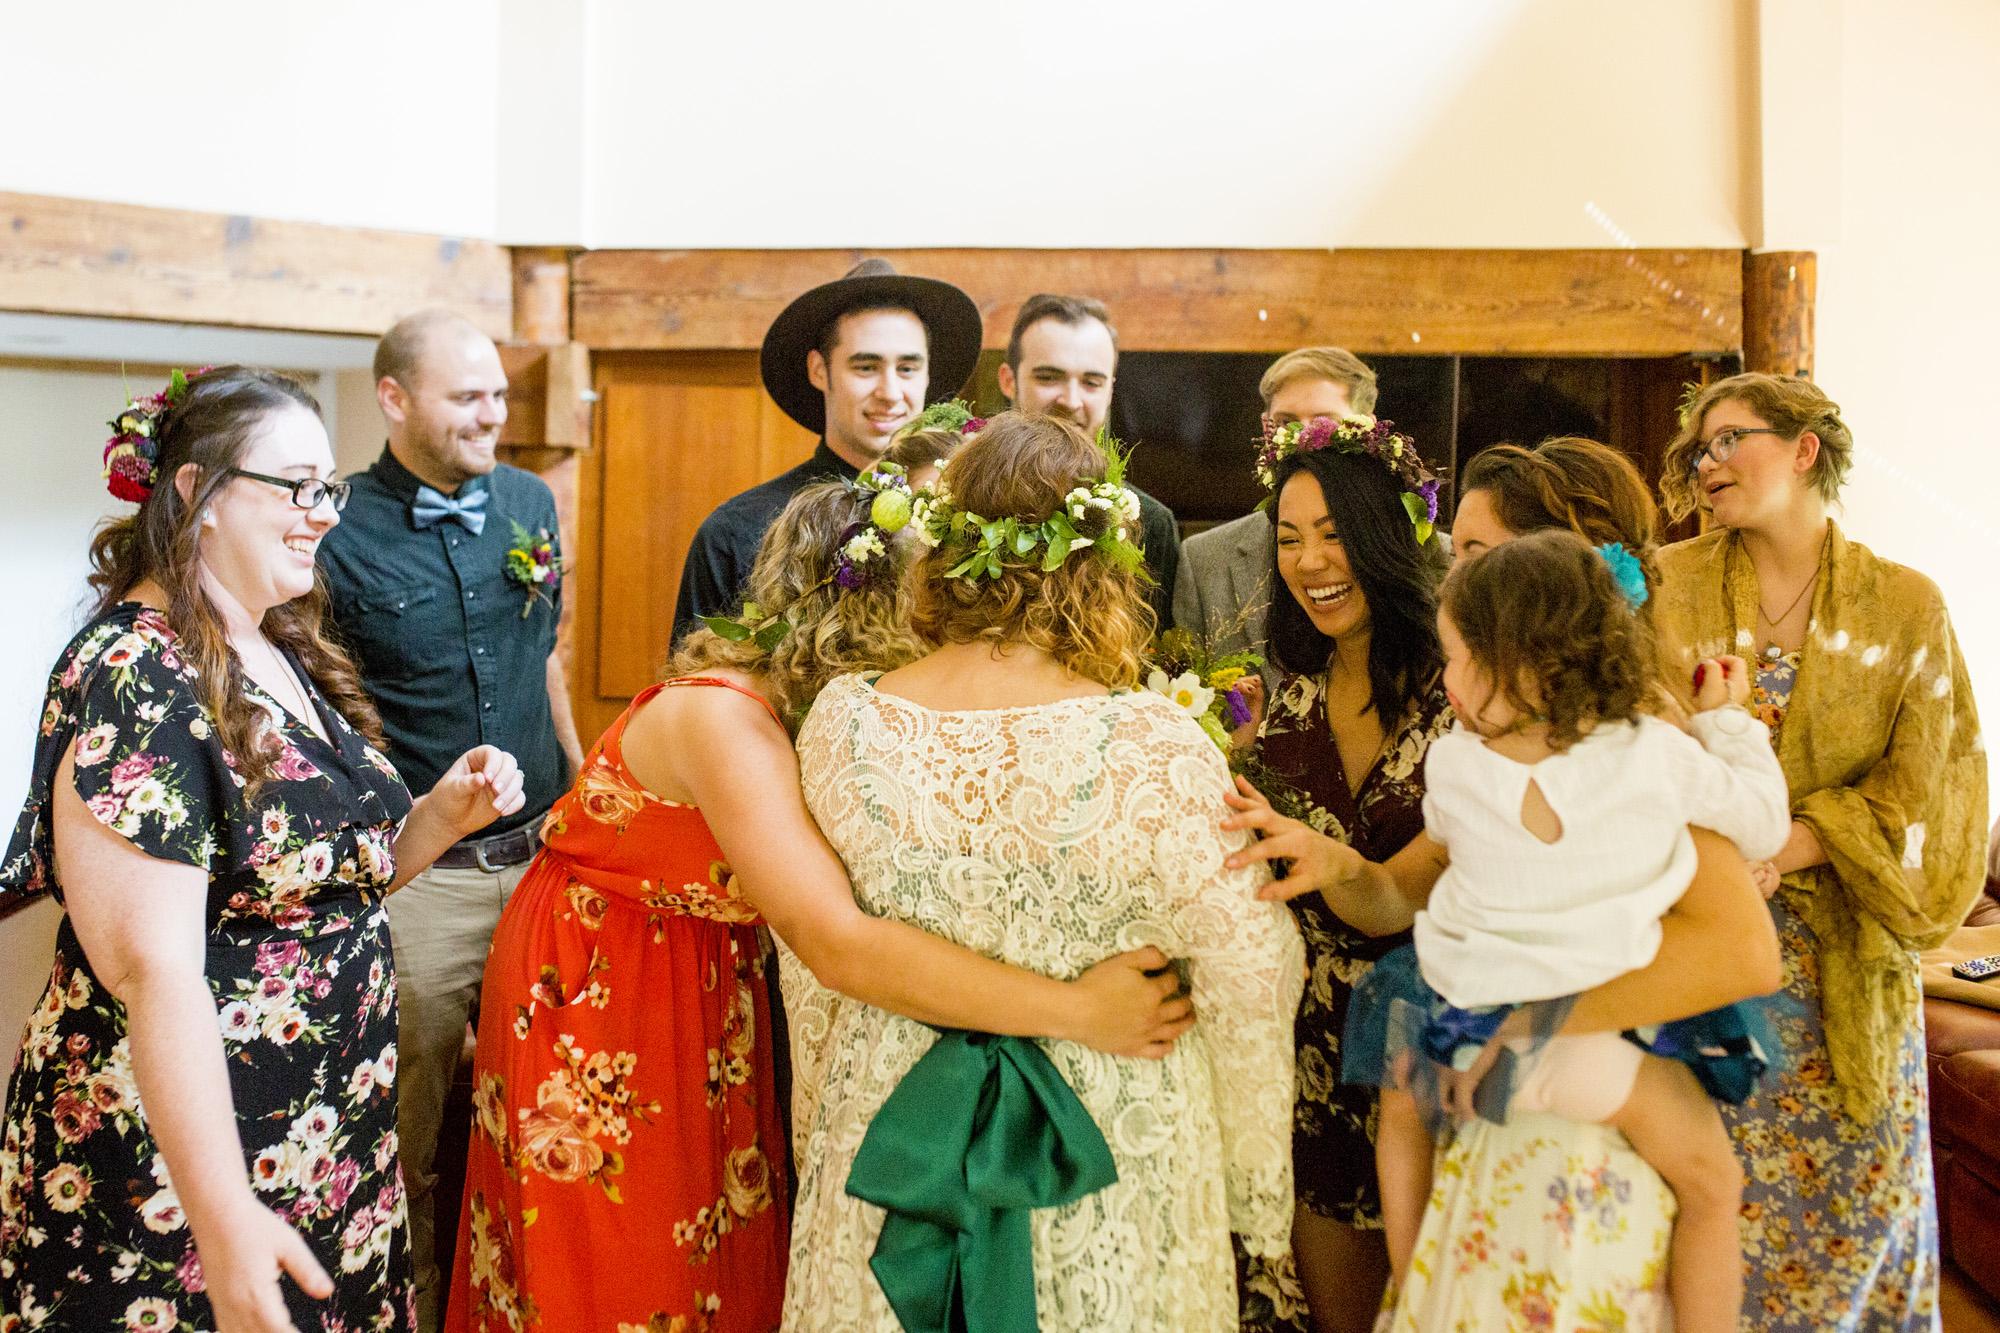 Seriously_Sabrina_Photography_Red_River_Gorge_Kentucky_Wedding_ShawnDana80.jpg